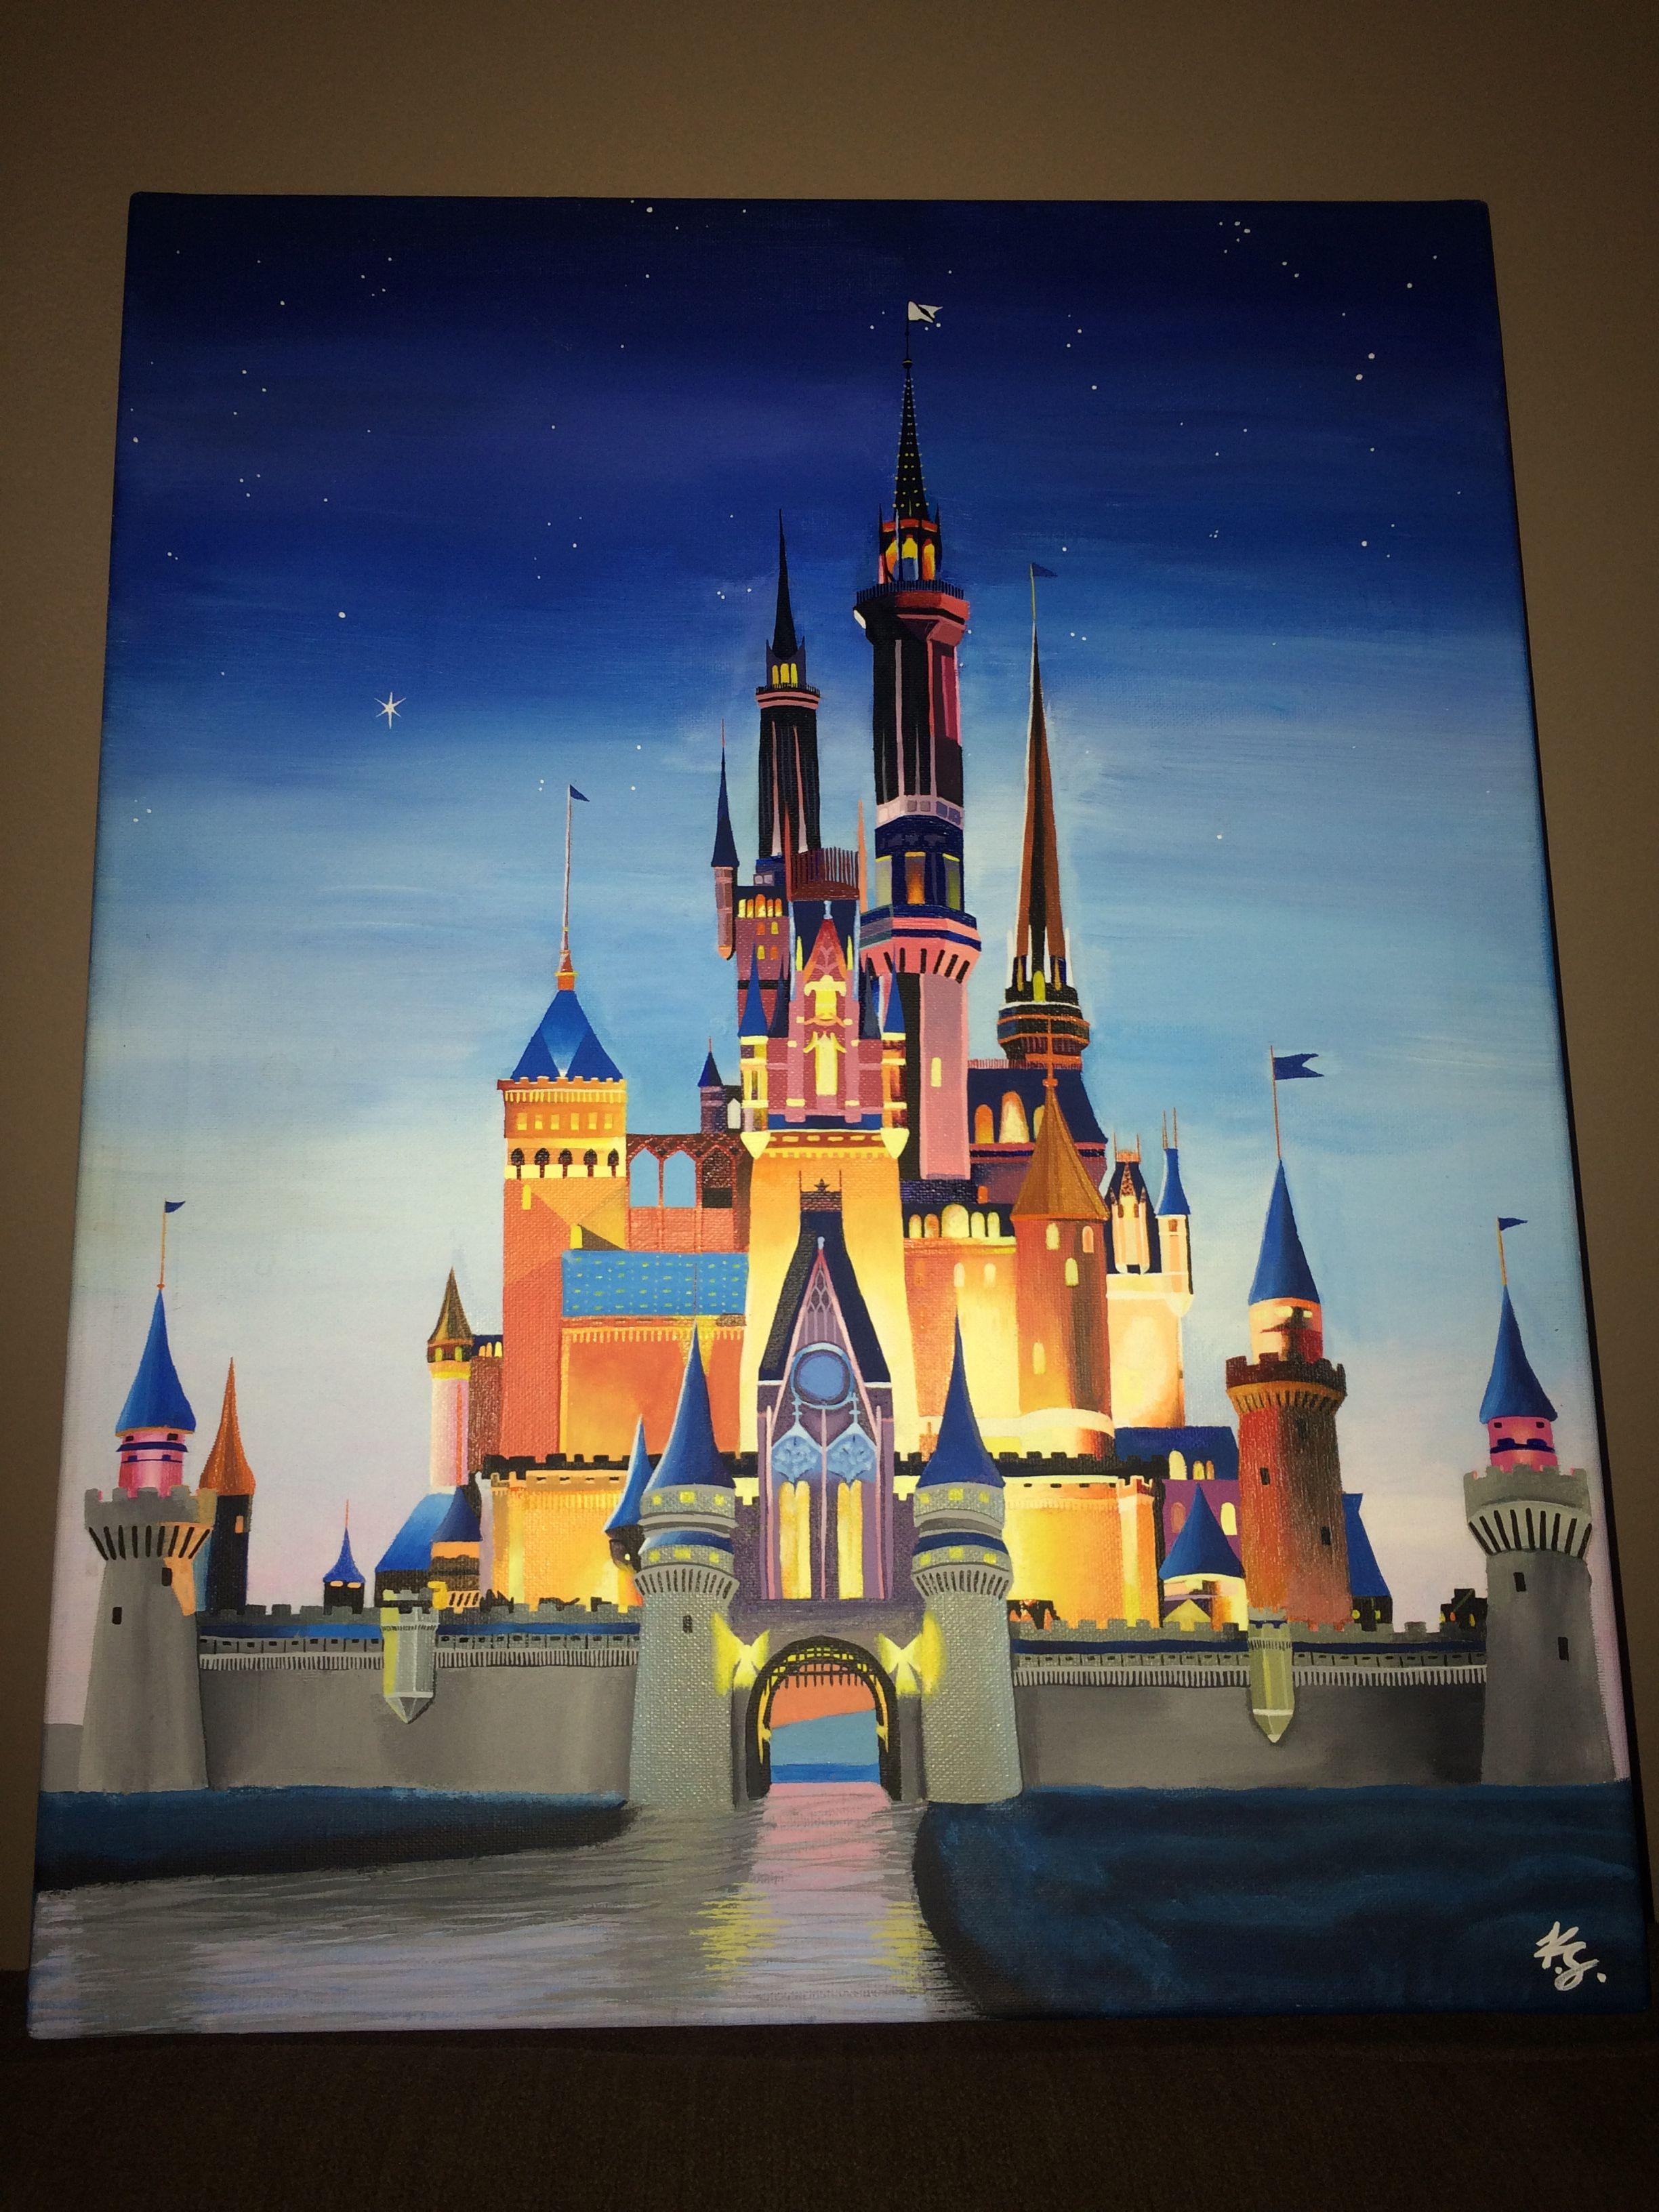 Disney Cinderella Castle Painting On Canvas $300 | Disney dedans Dessin Chateau Disney